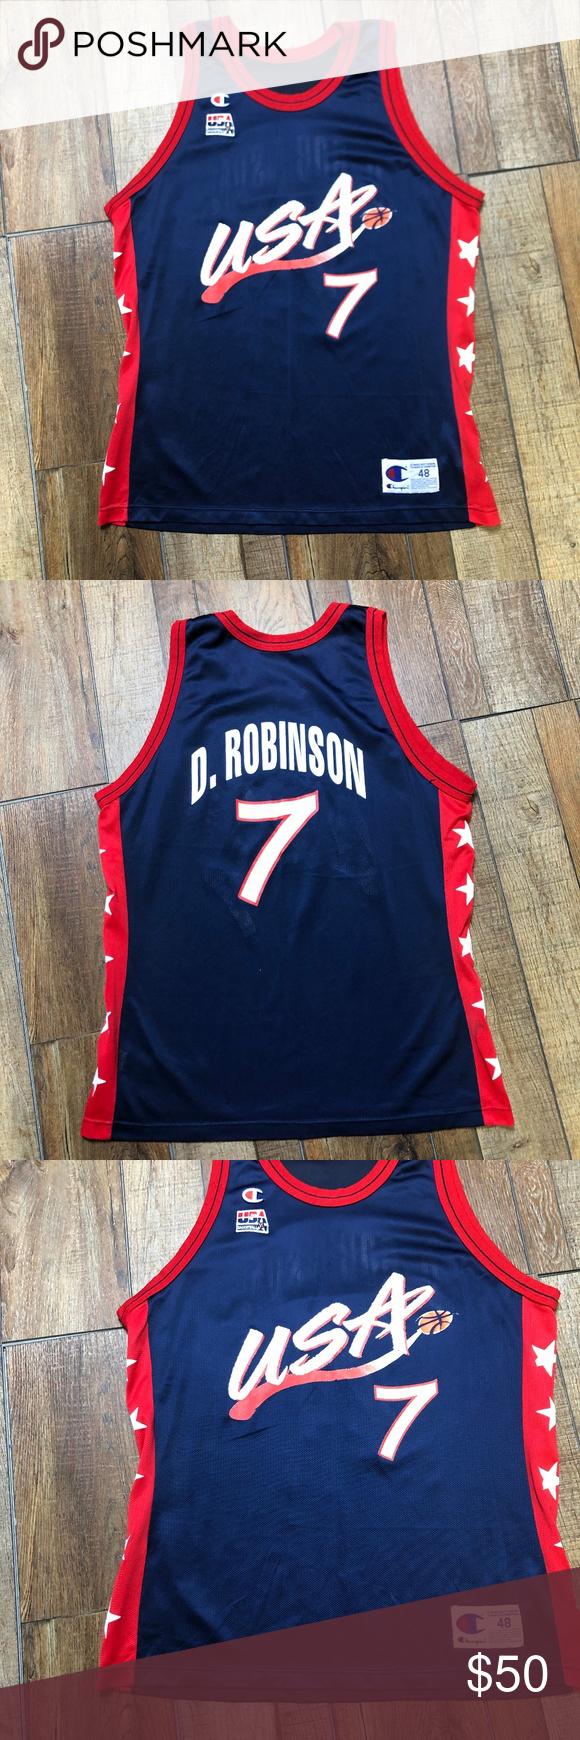 low priced 99daf 121b9 David Robinson USA Dream Team Olympics NBA Jersey Perfect ...